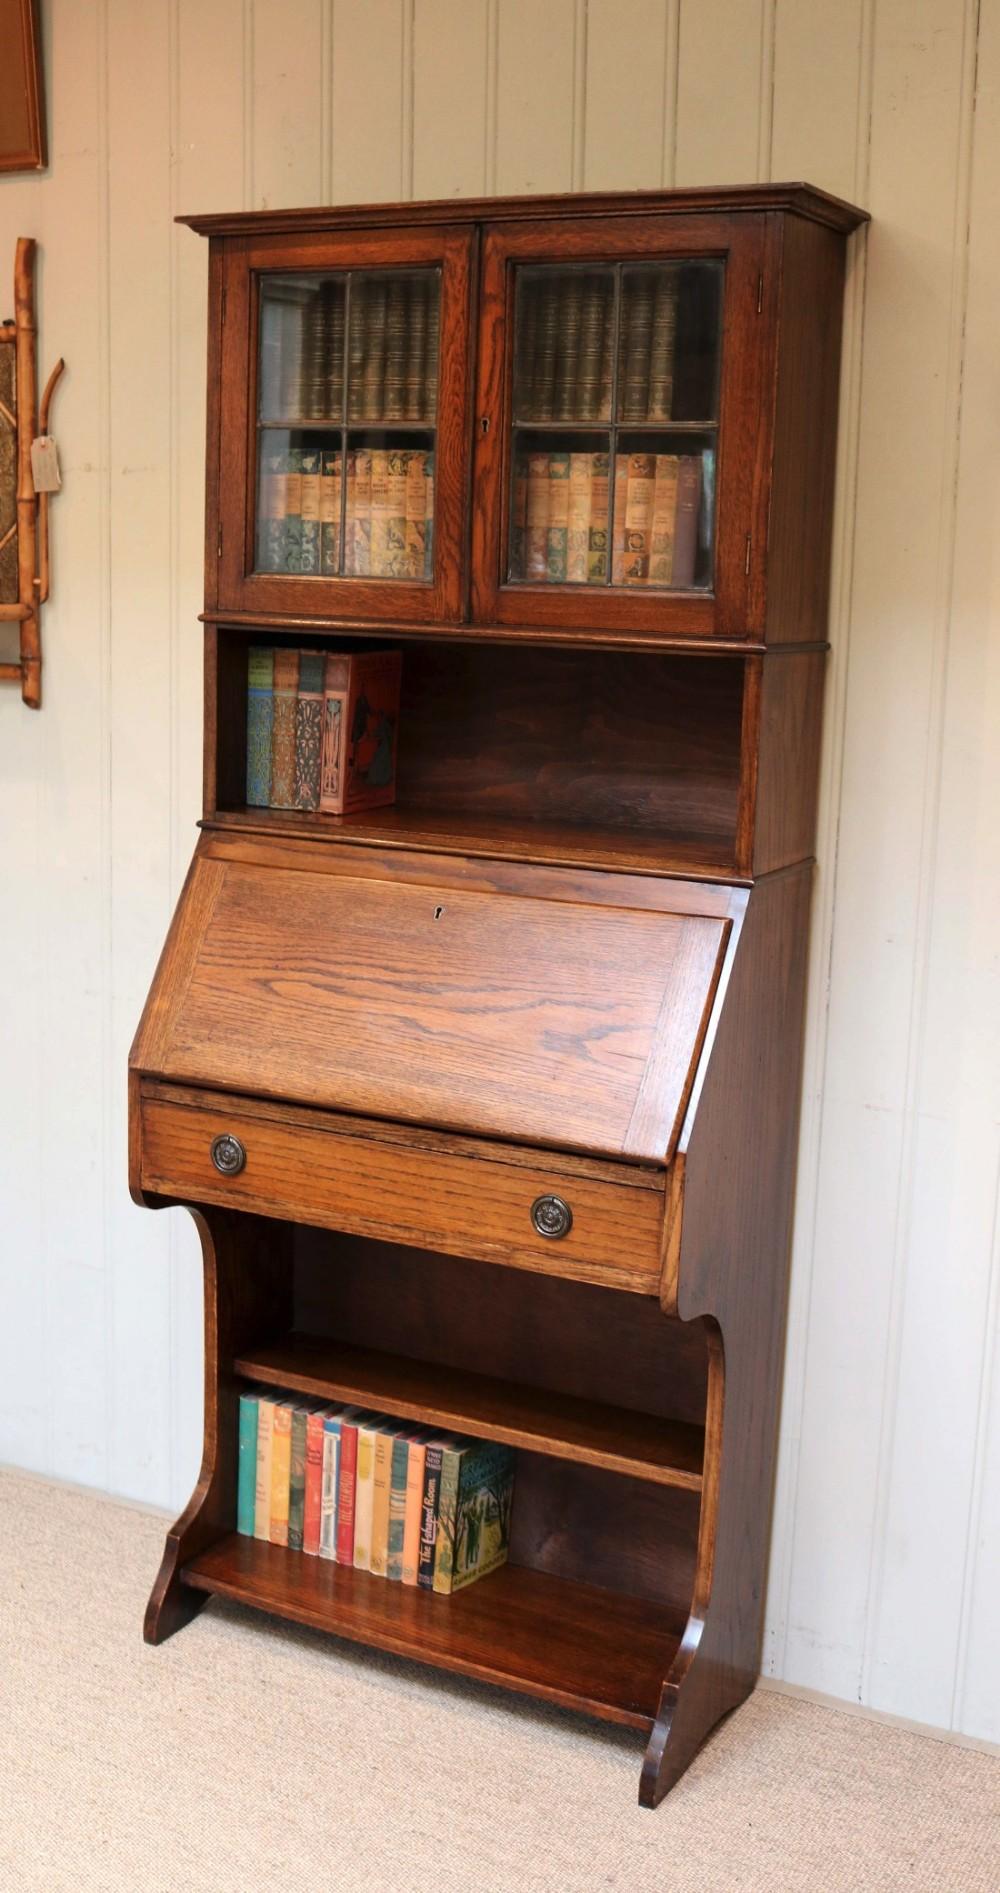 Bookcase 29 Inches Wide